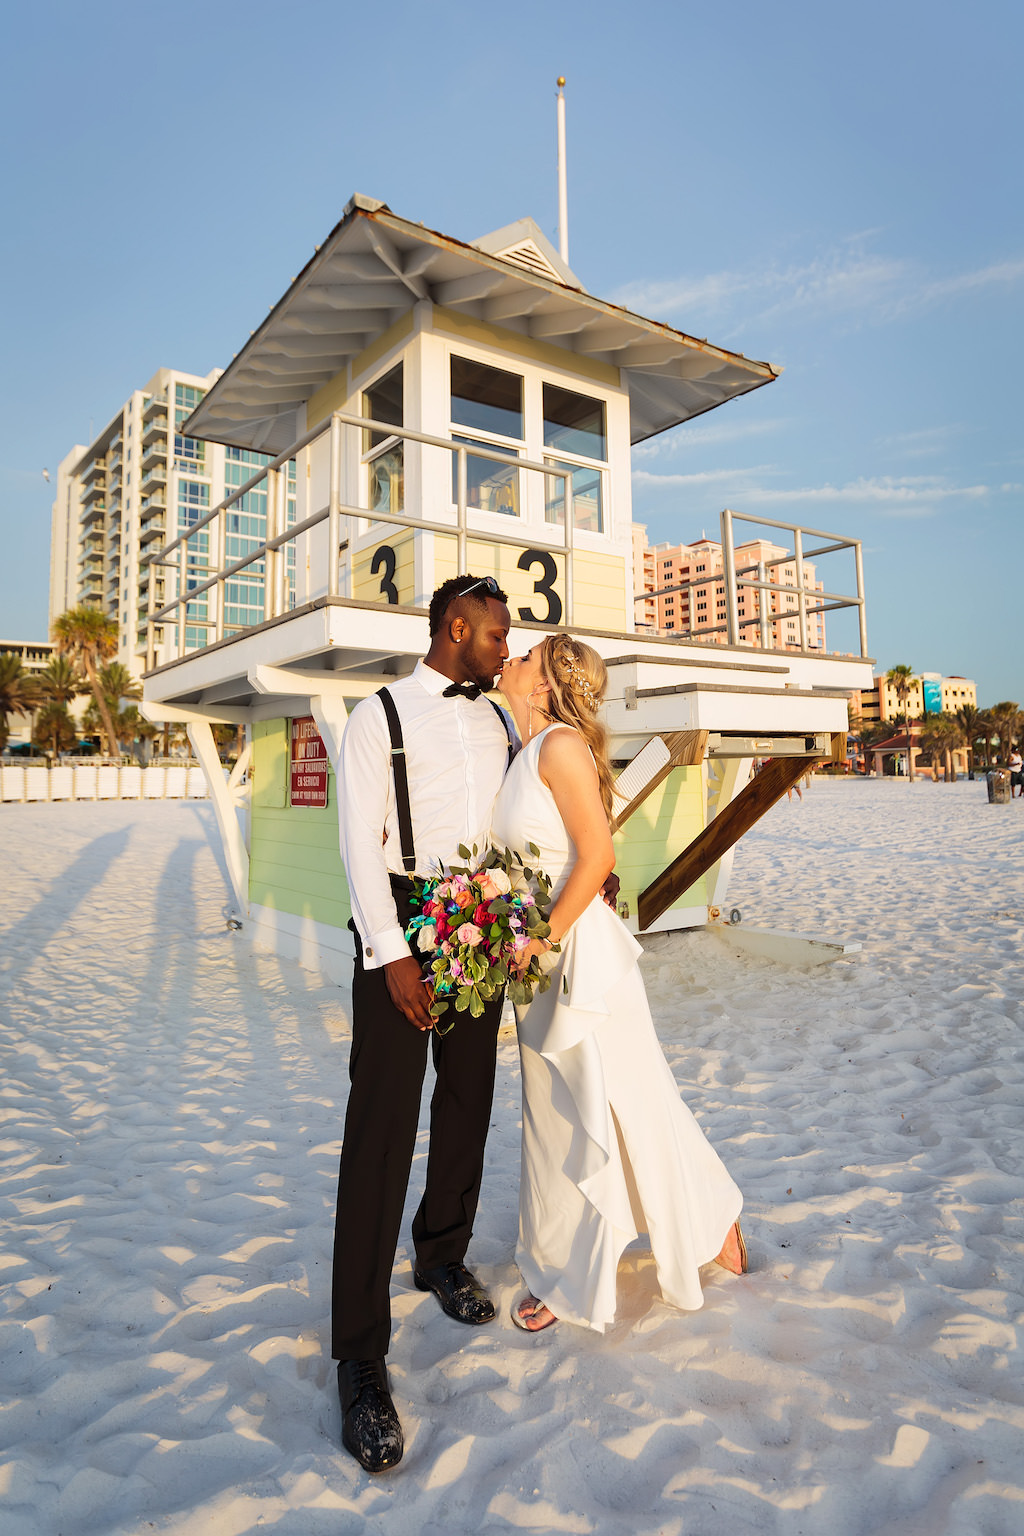 Florida Bride and Groom Wedding Portrait on Beach